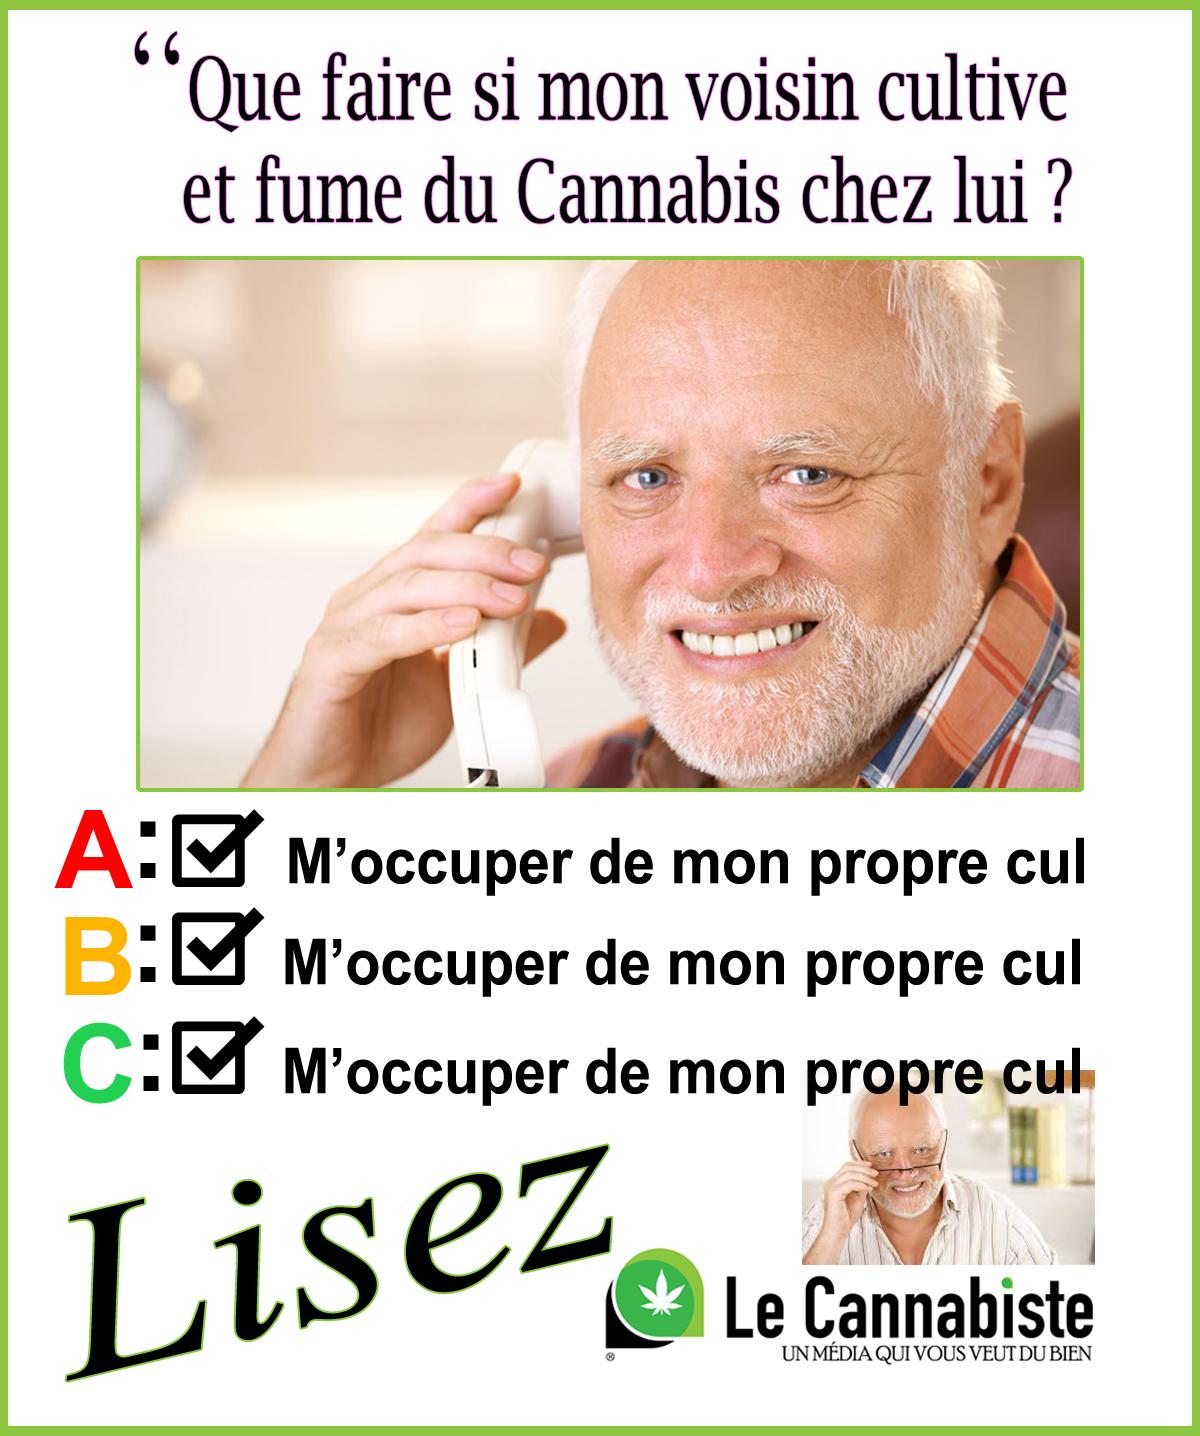 Le Cannabiste Delation